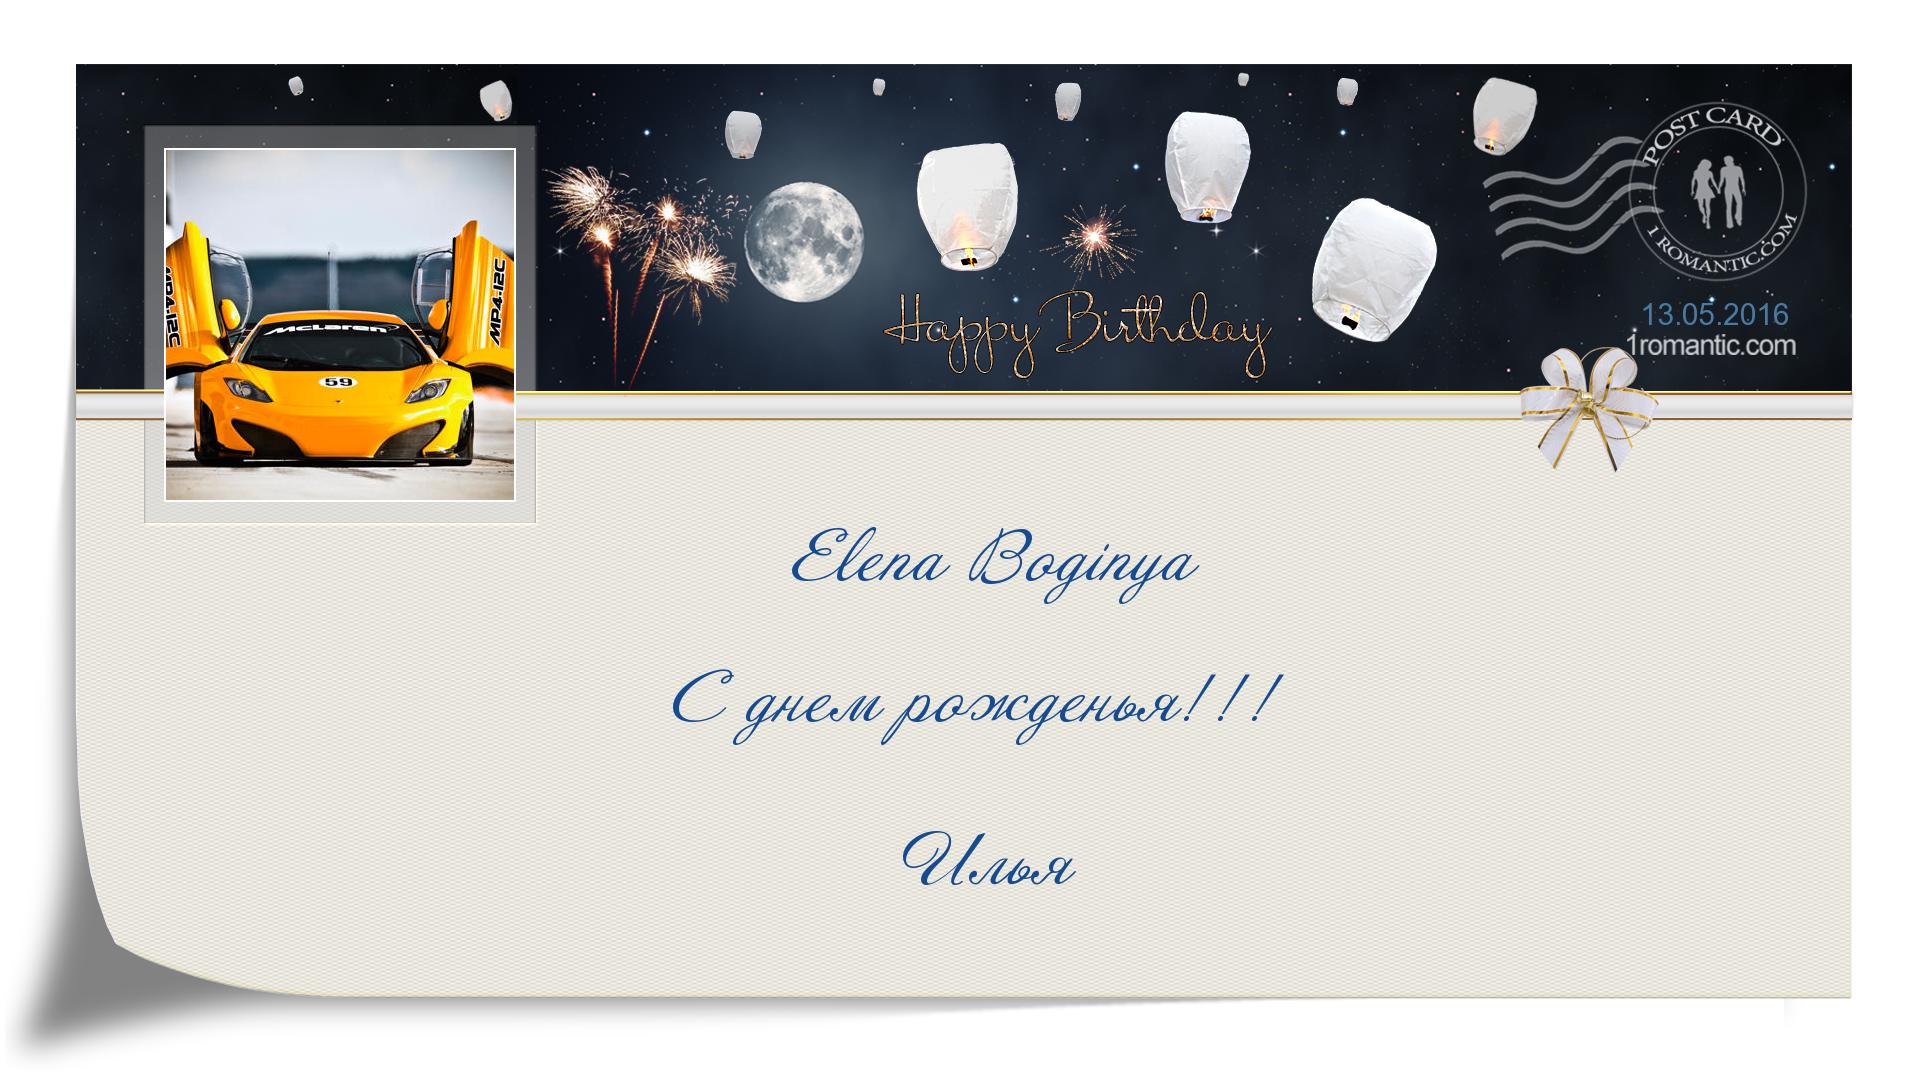 Elena Boginya